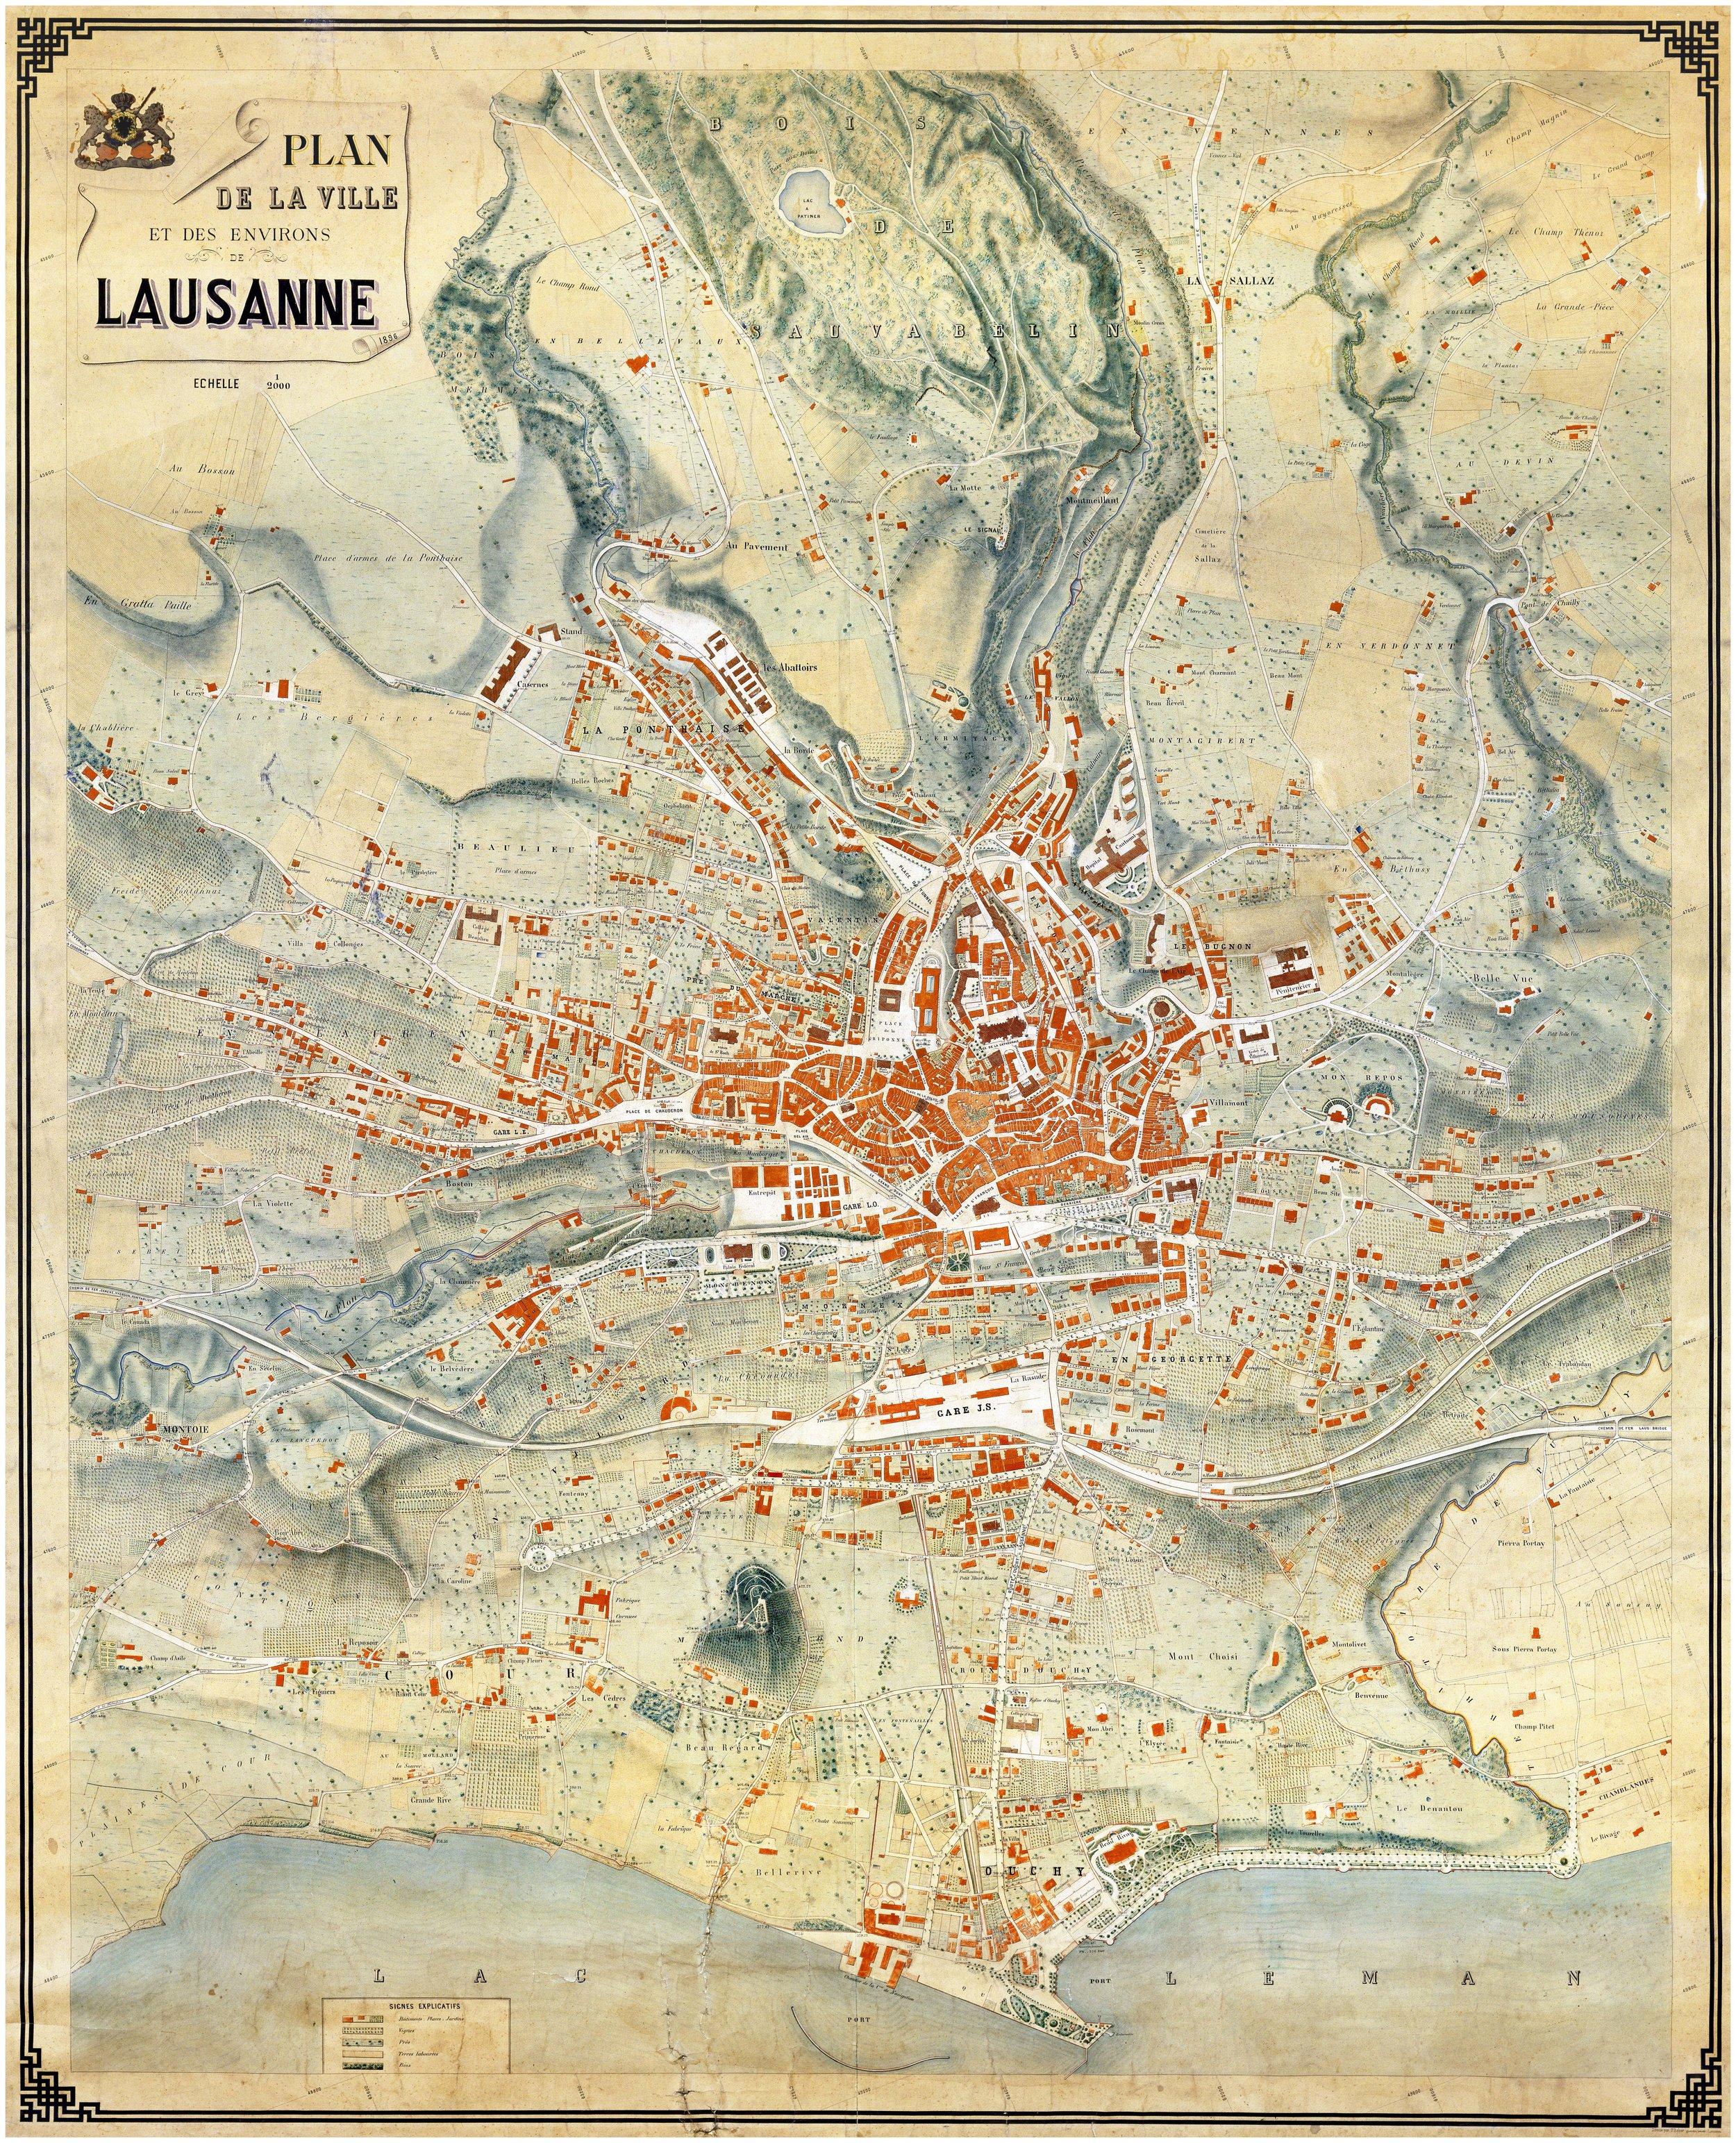 1896_lausanne-print copy.jpg